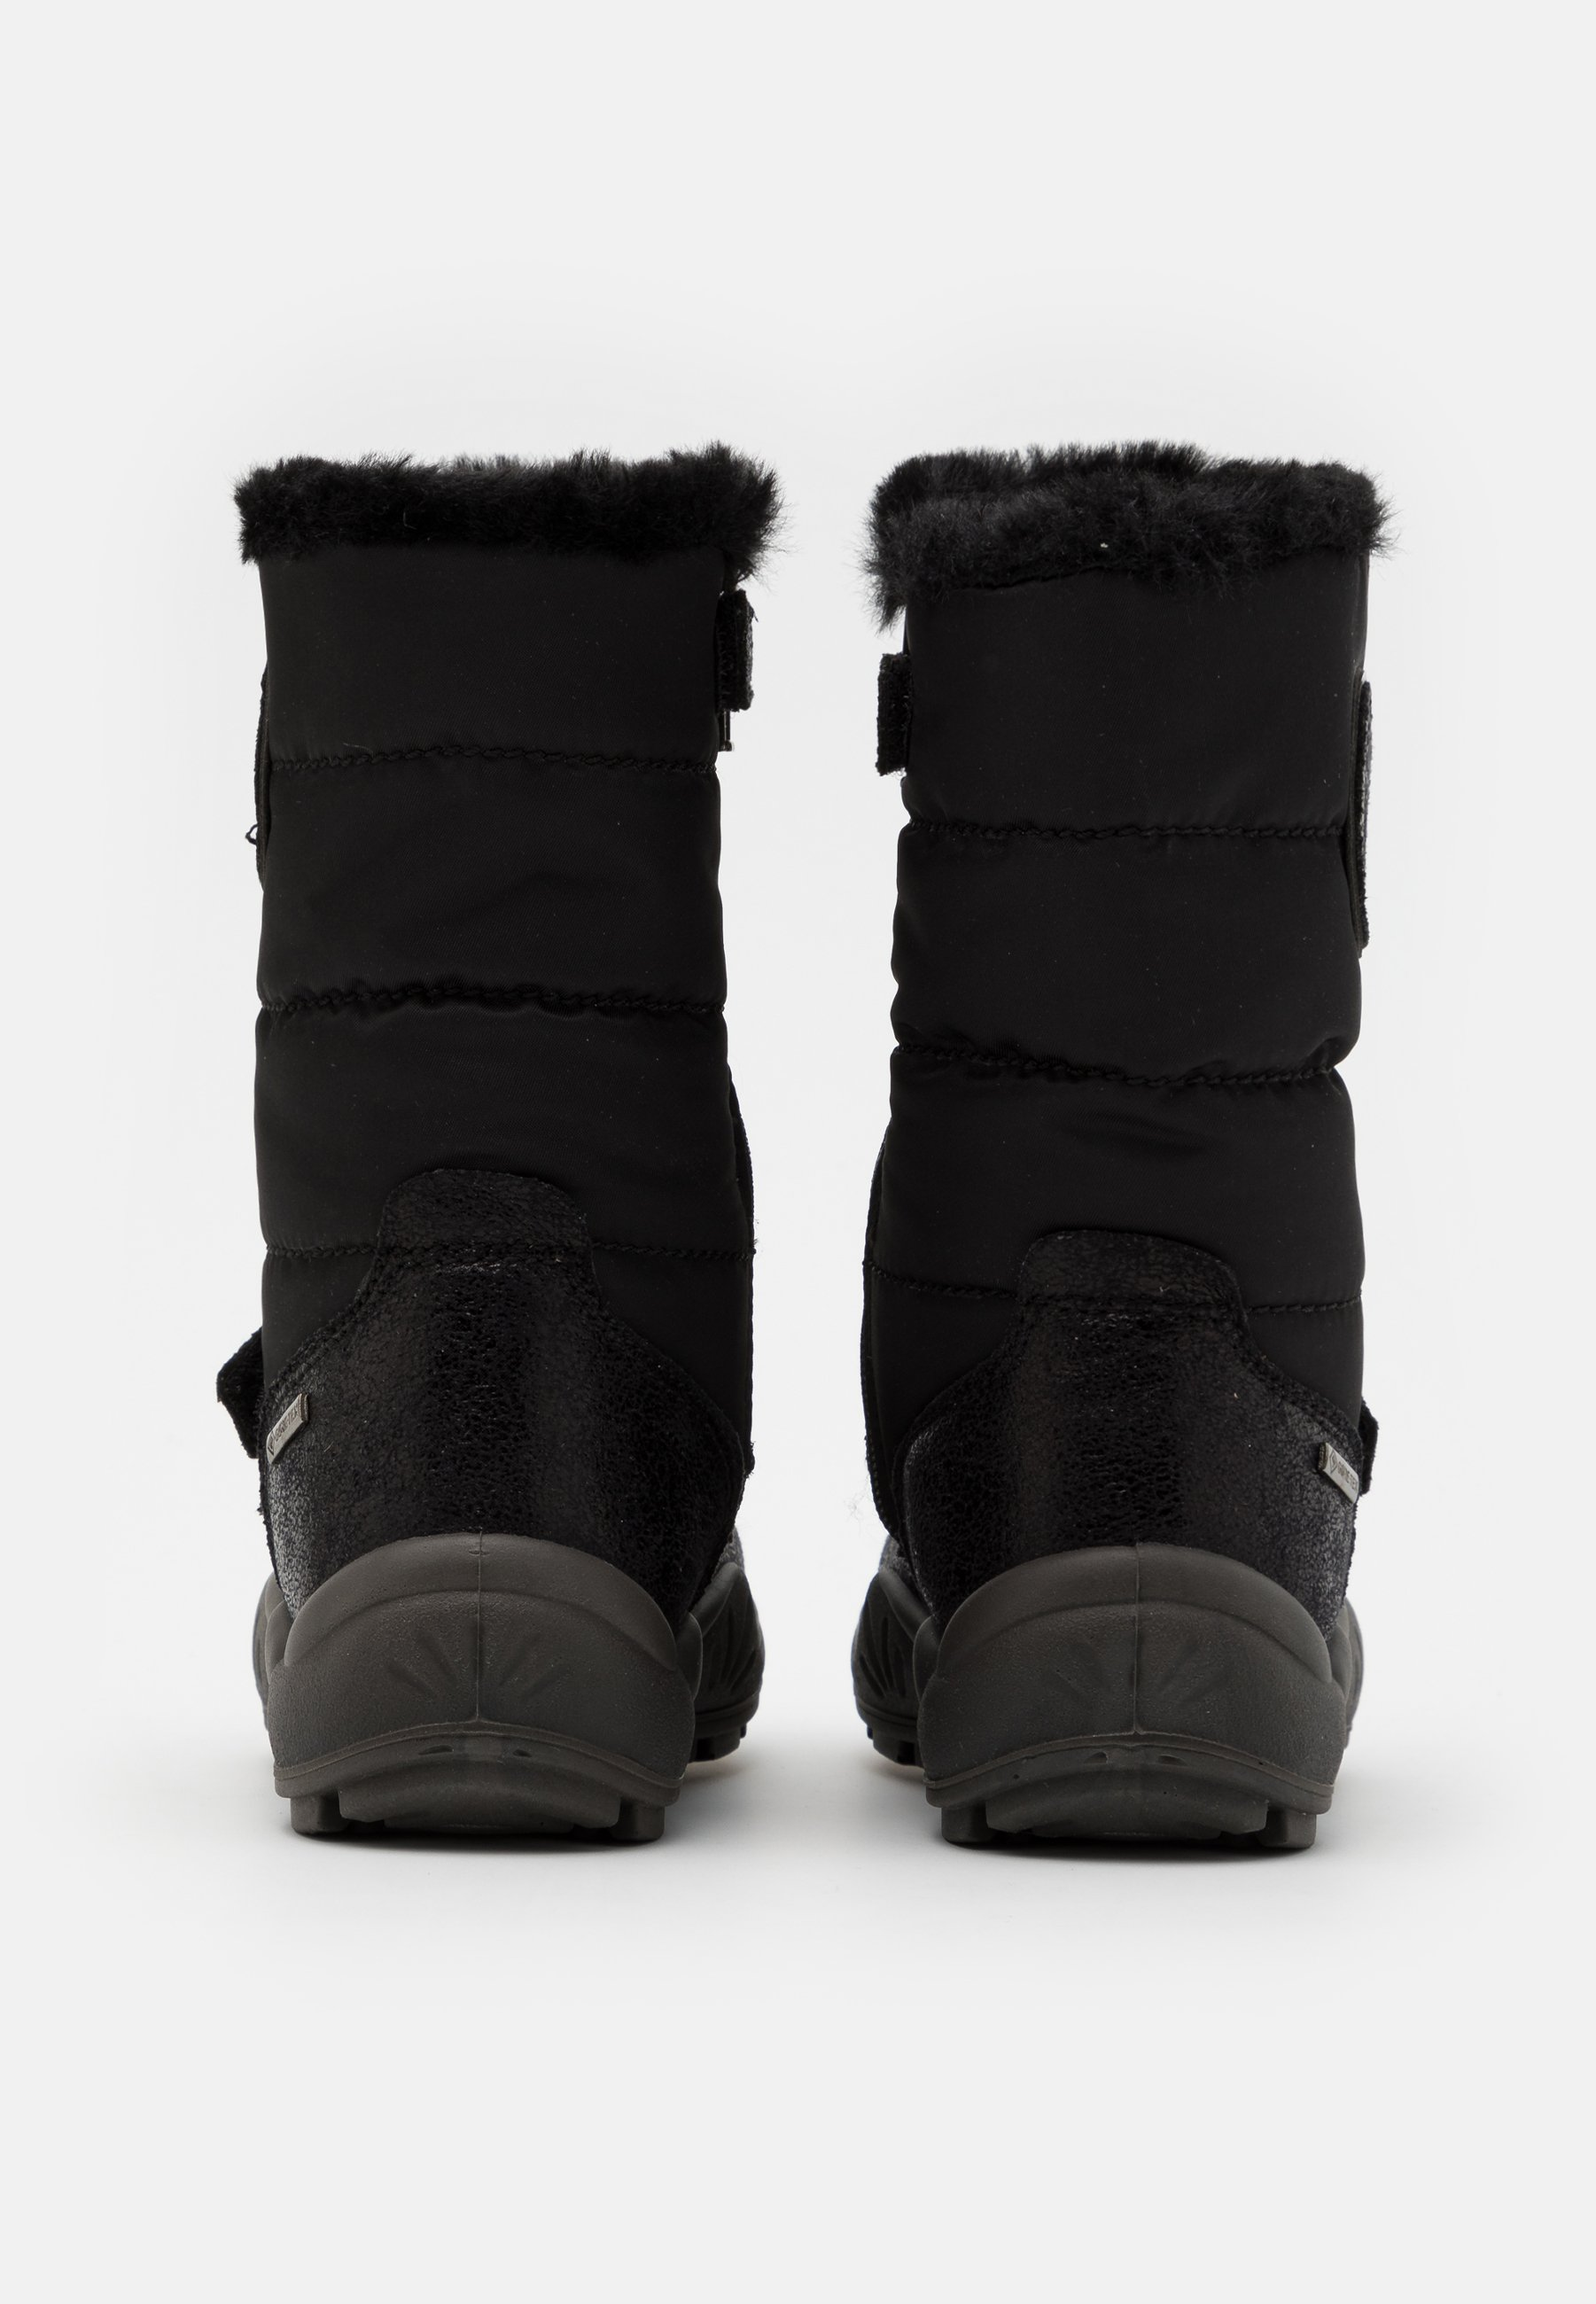 Excellent Cheapest Primigi Winter boots - nero | kids shoes 2020 fsBgx